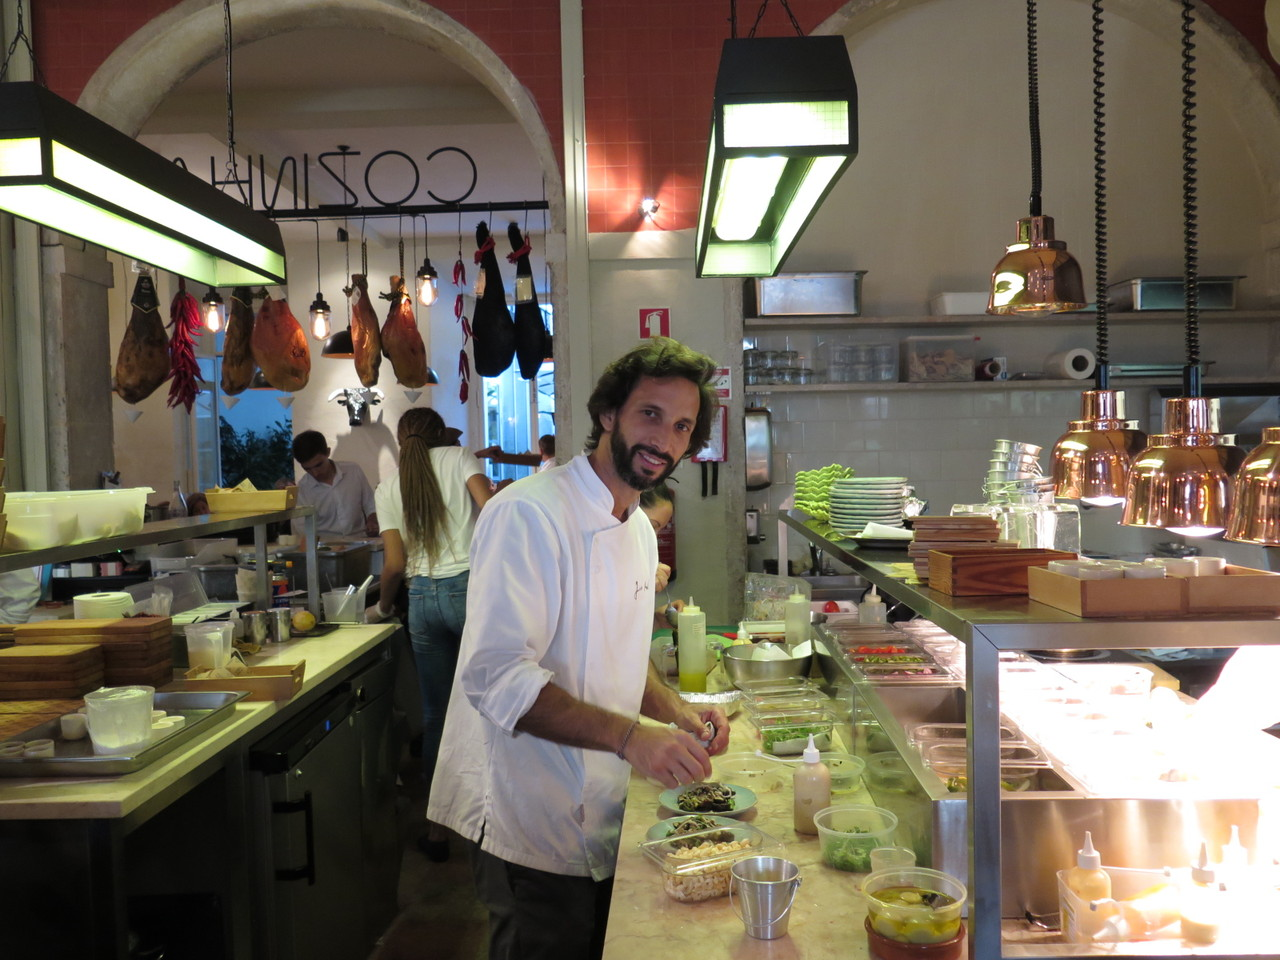 José Avillez finalizando o prato de espargos e cogumelos